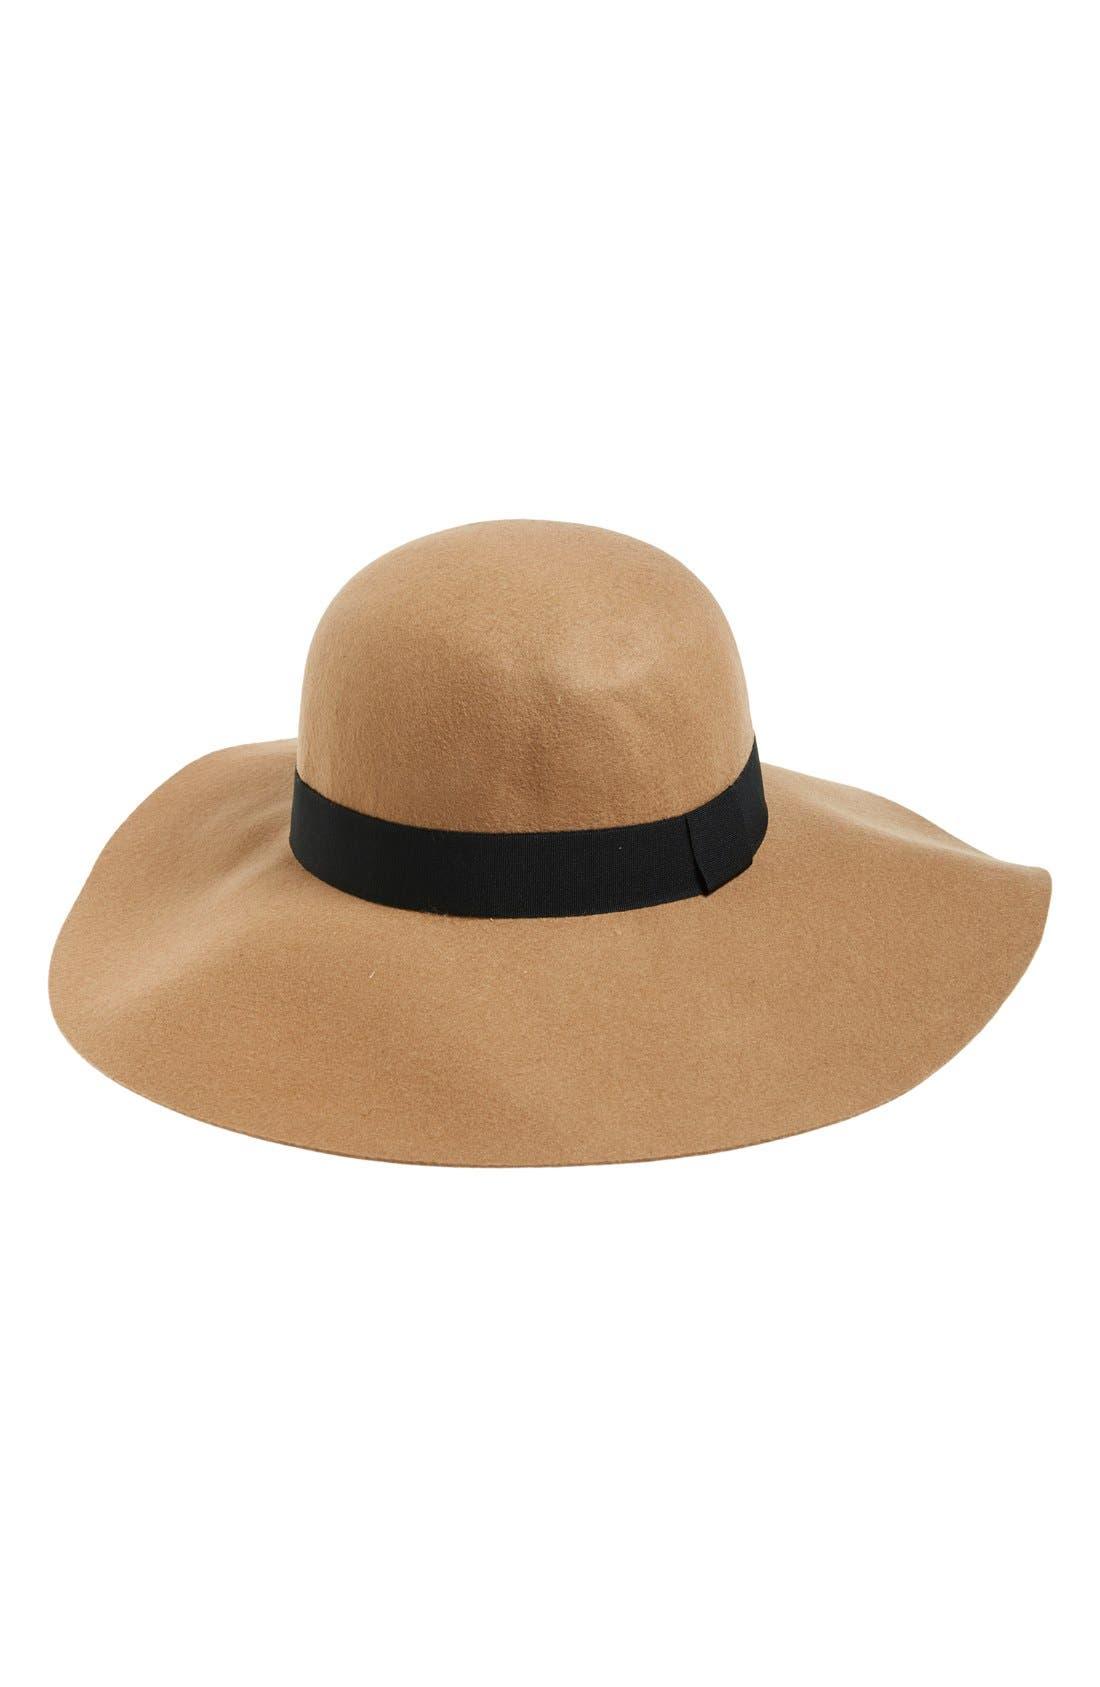 Main Image - David & Young Floppy Felt Hat